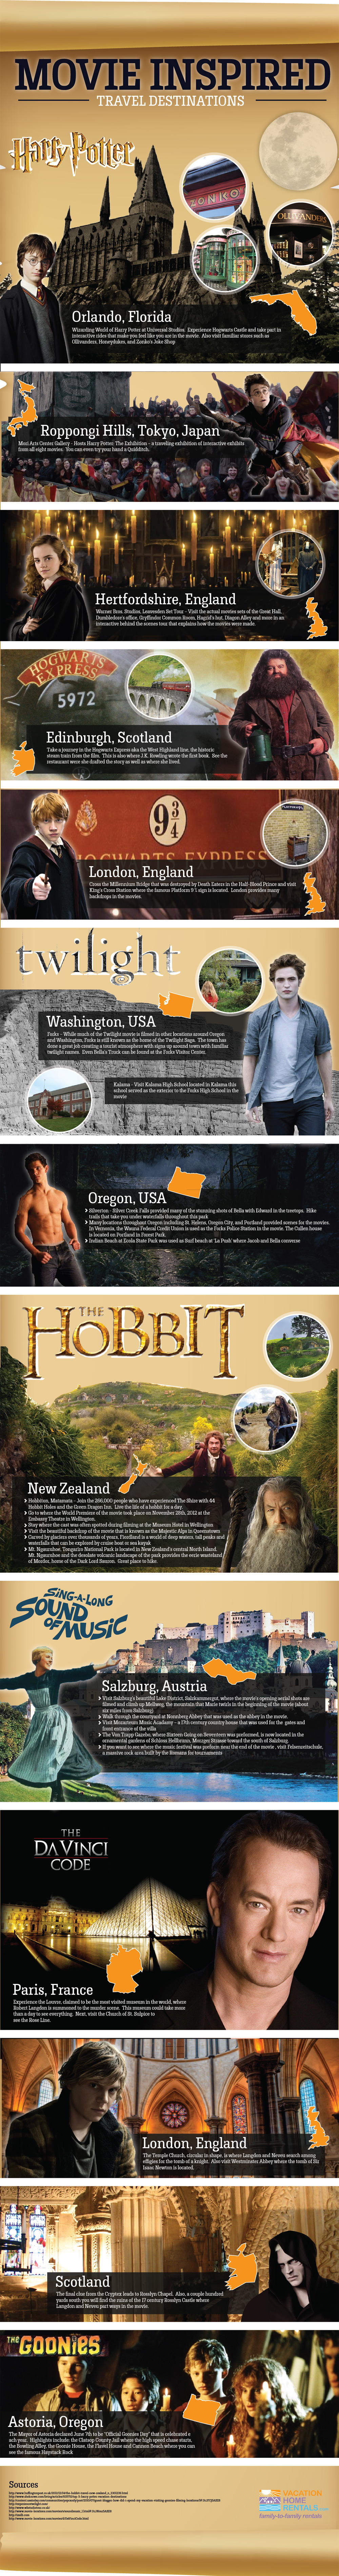 Movie Inspired Travel Destinations